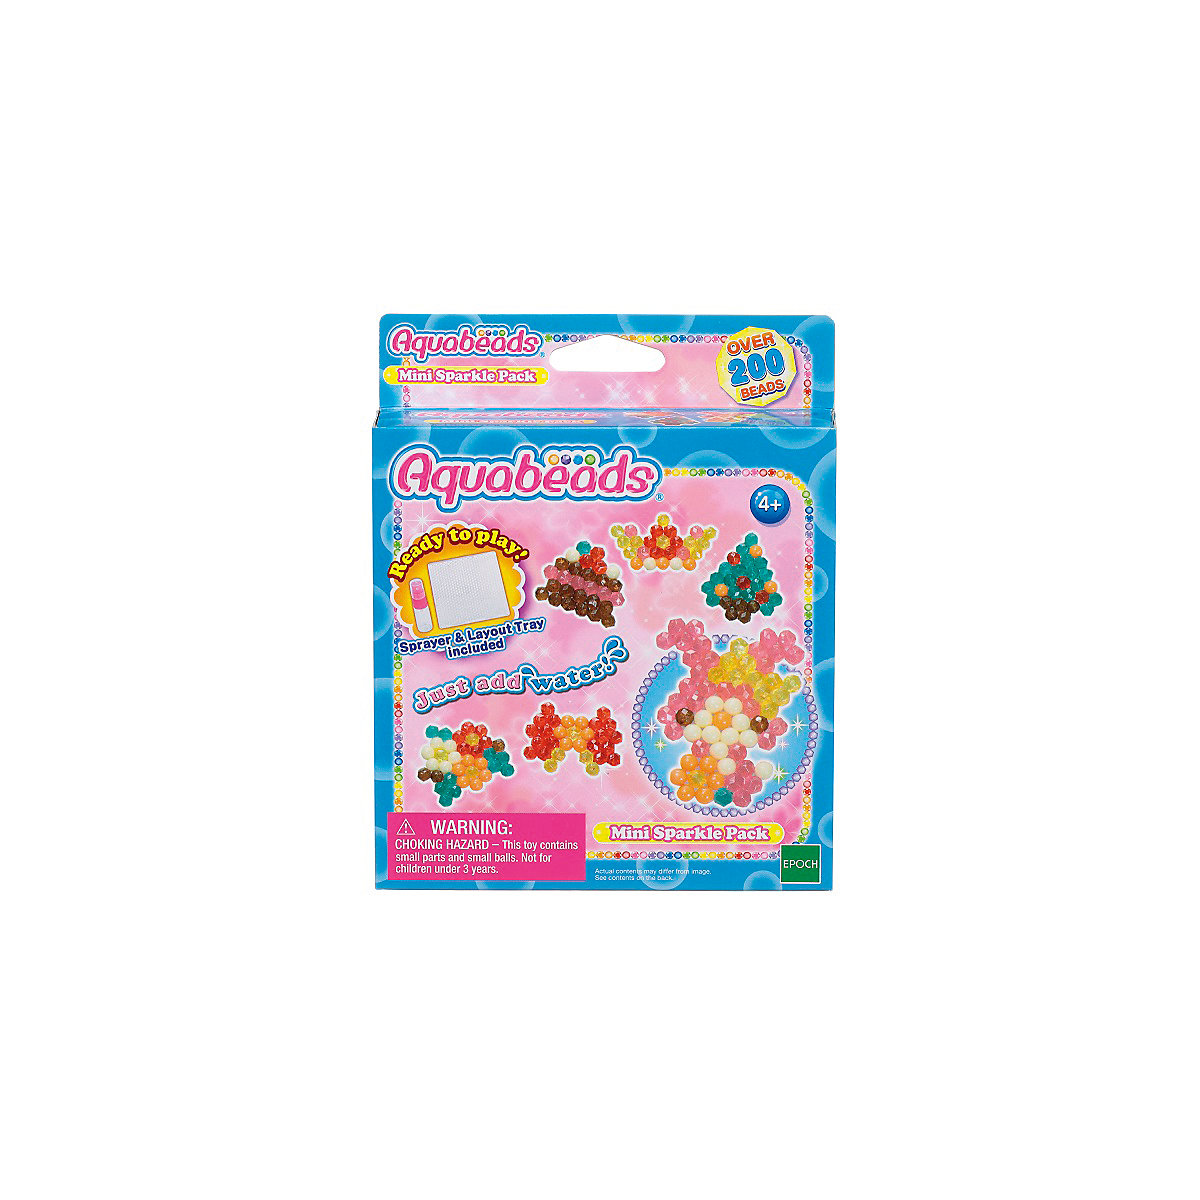 Мини мозаика из бусин Aquabeads Сверкающие игрушки